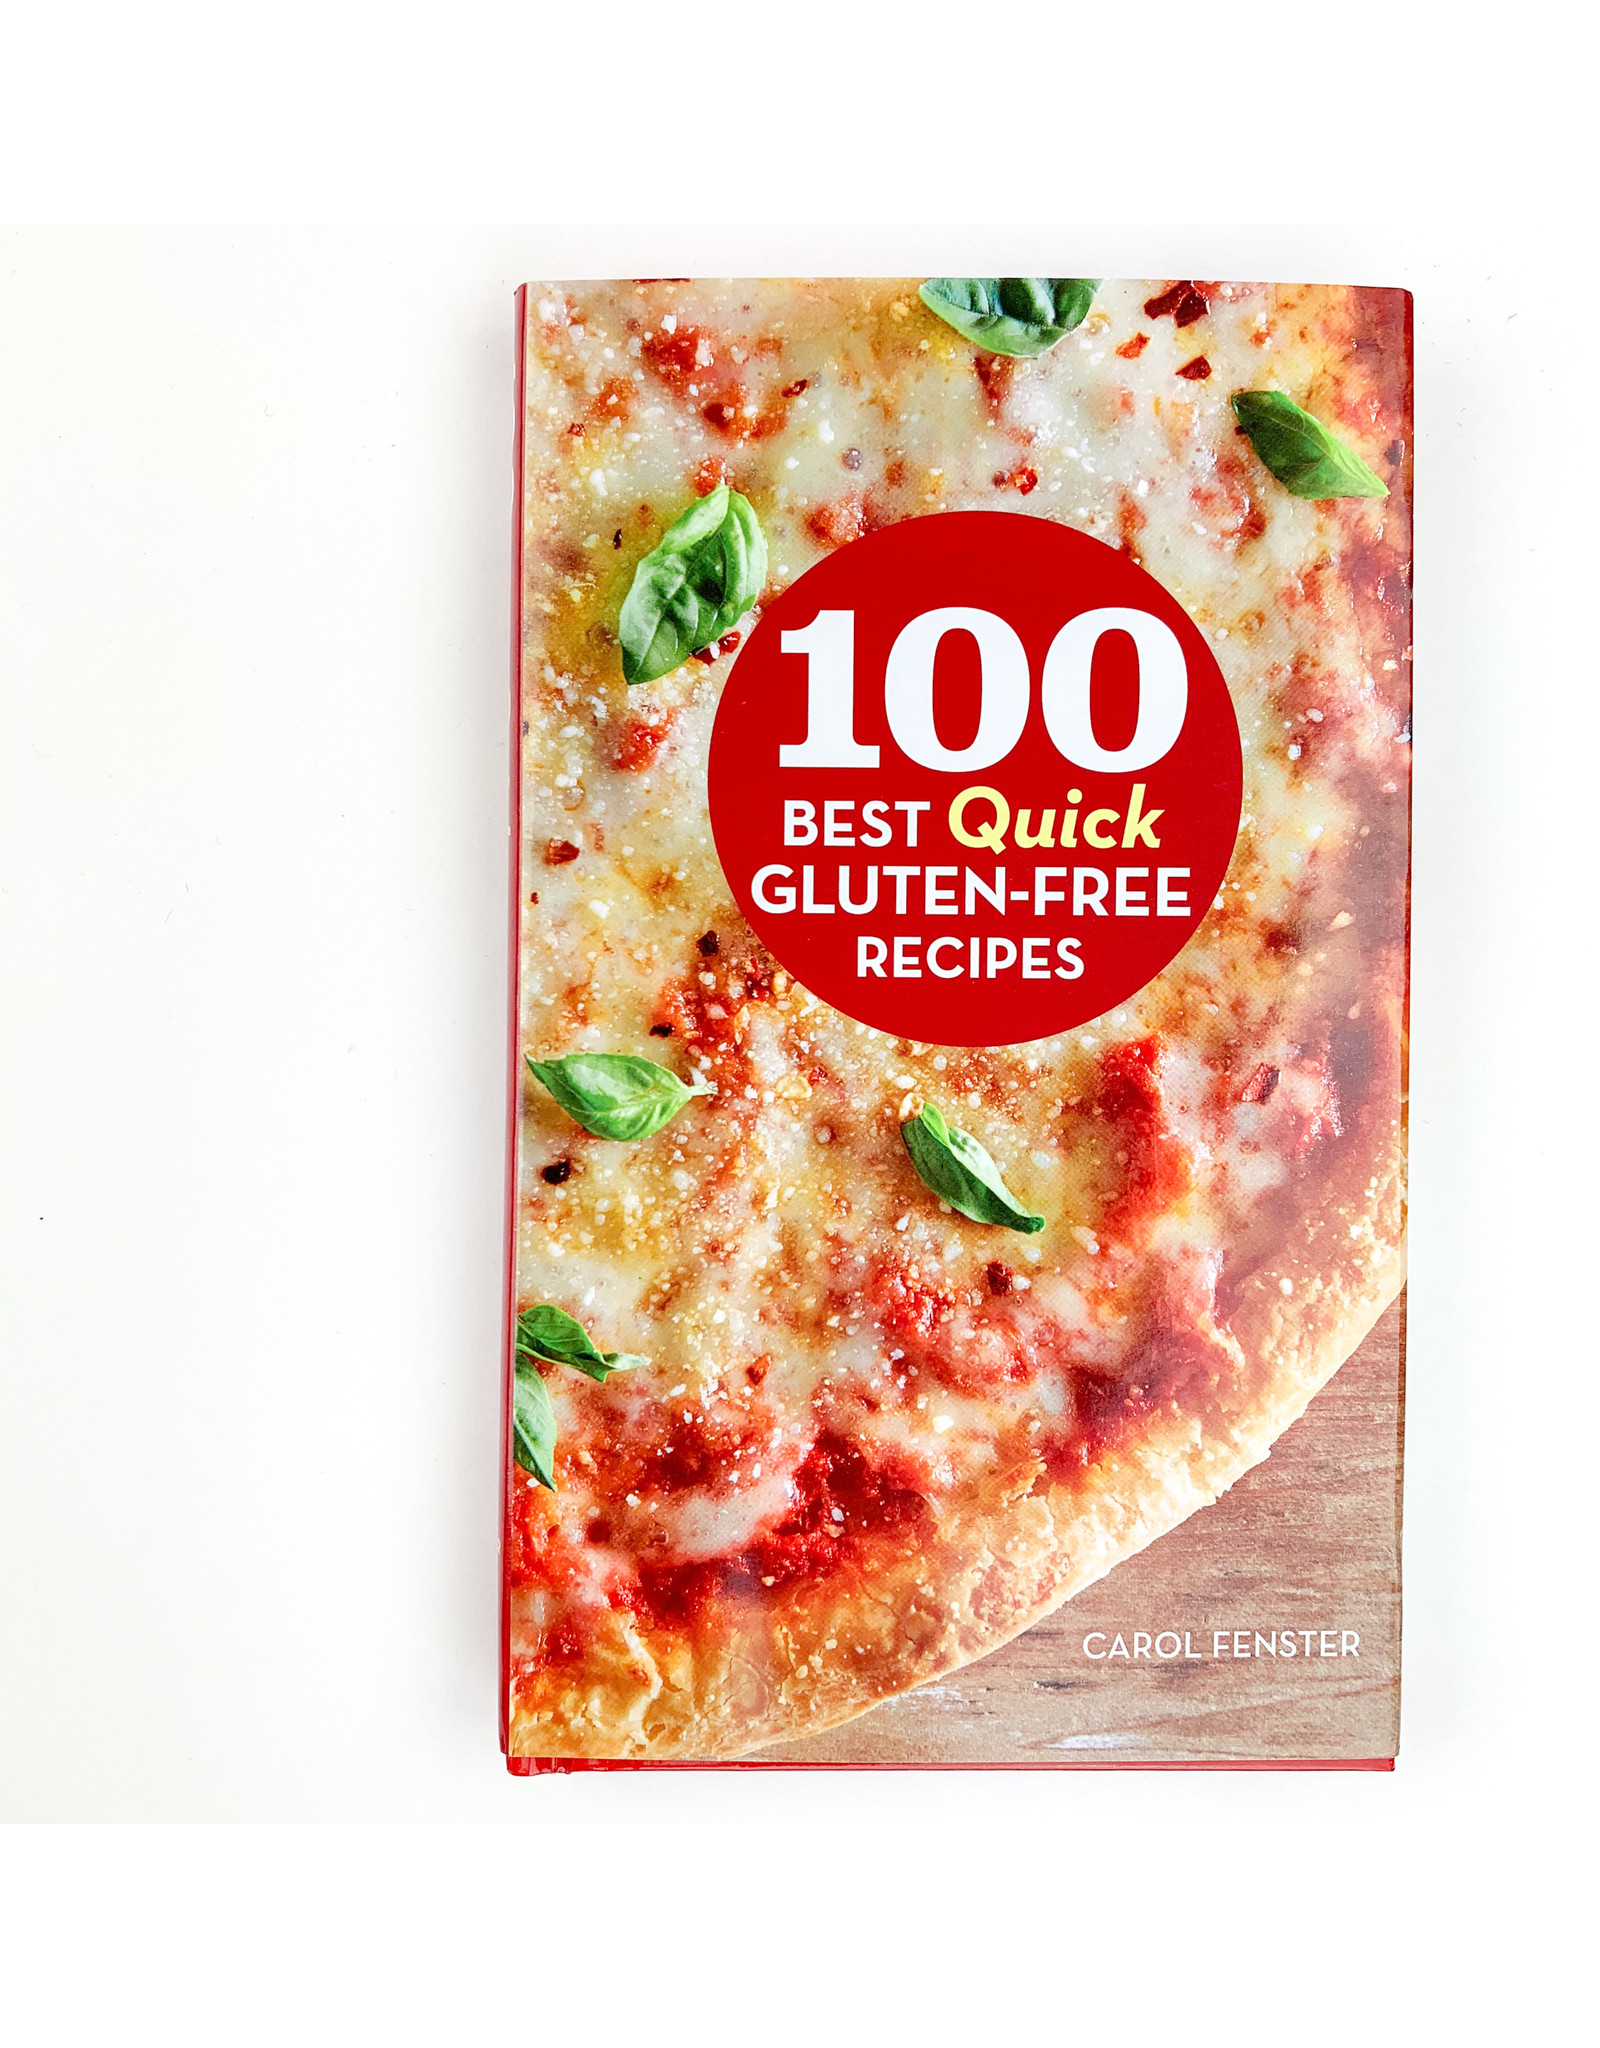 100 Best Quick GF Recipes